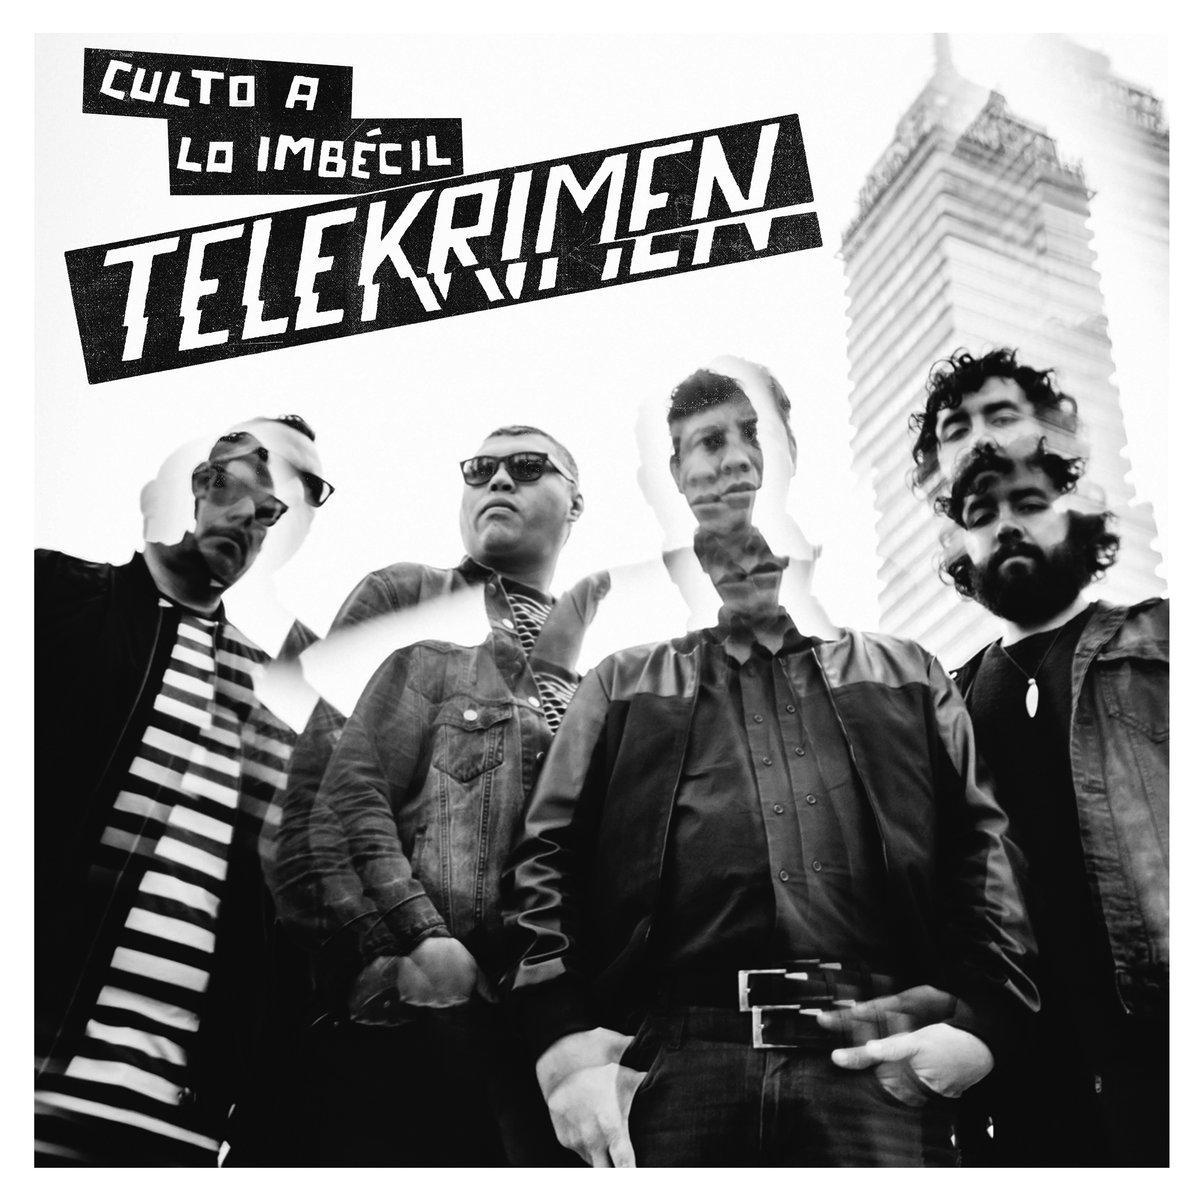 Telekrimen - Culto a lo Imbécil 1 - fanzine